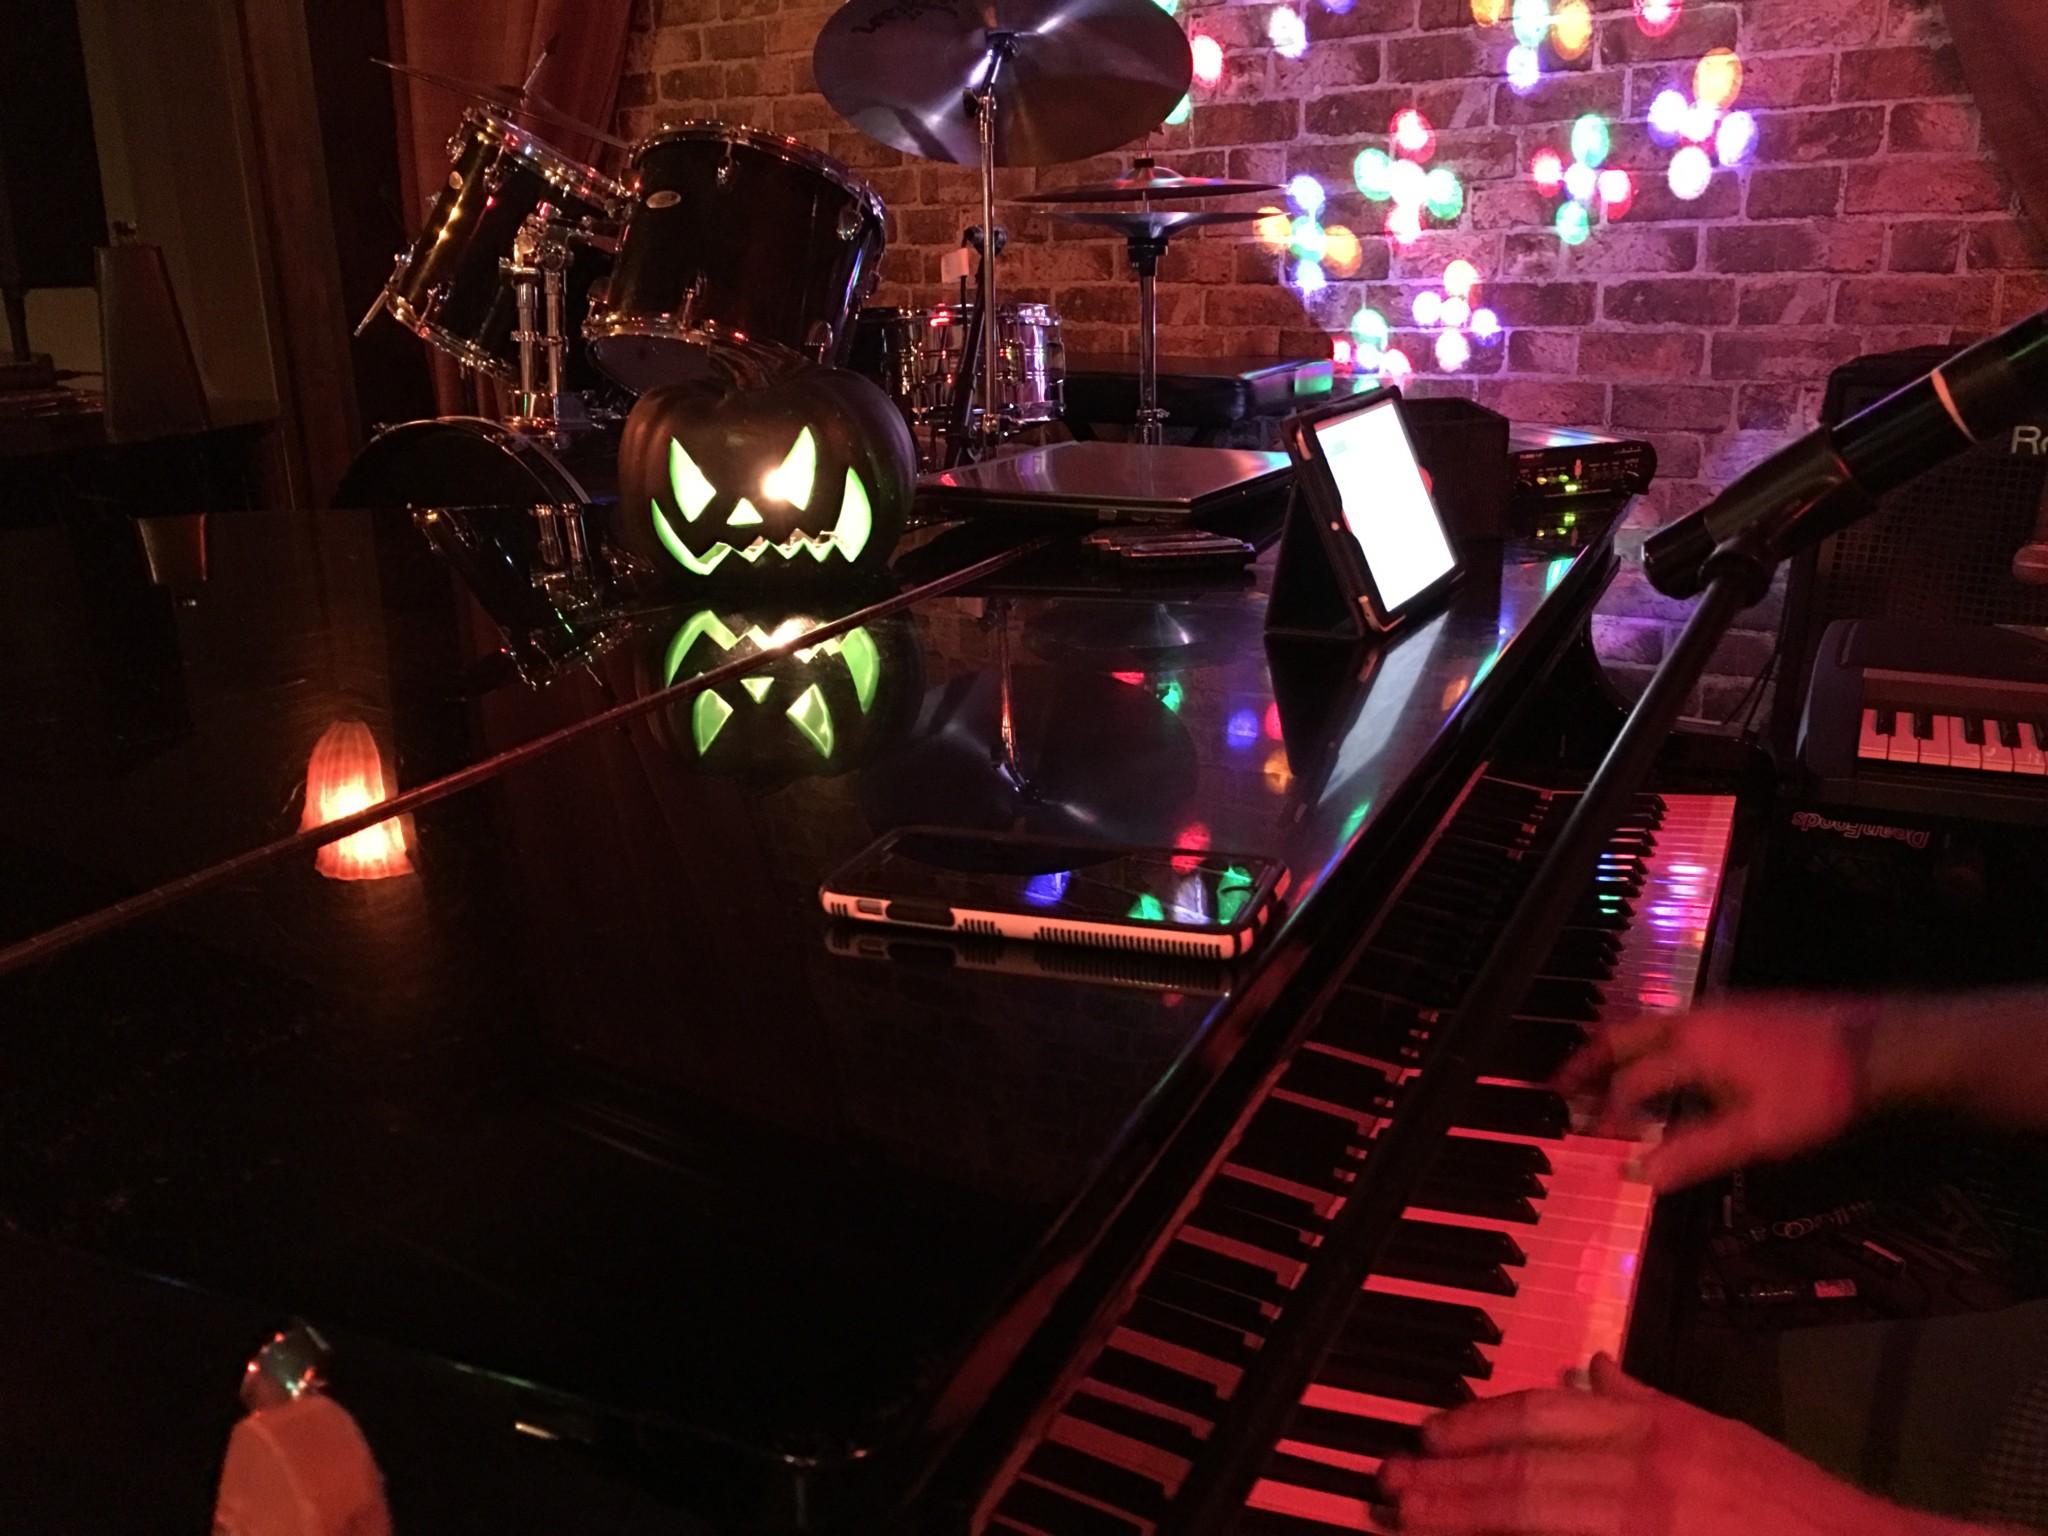 The Ridler Piano Bar